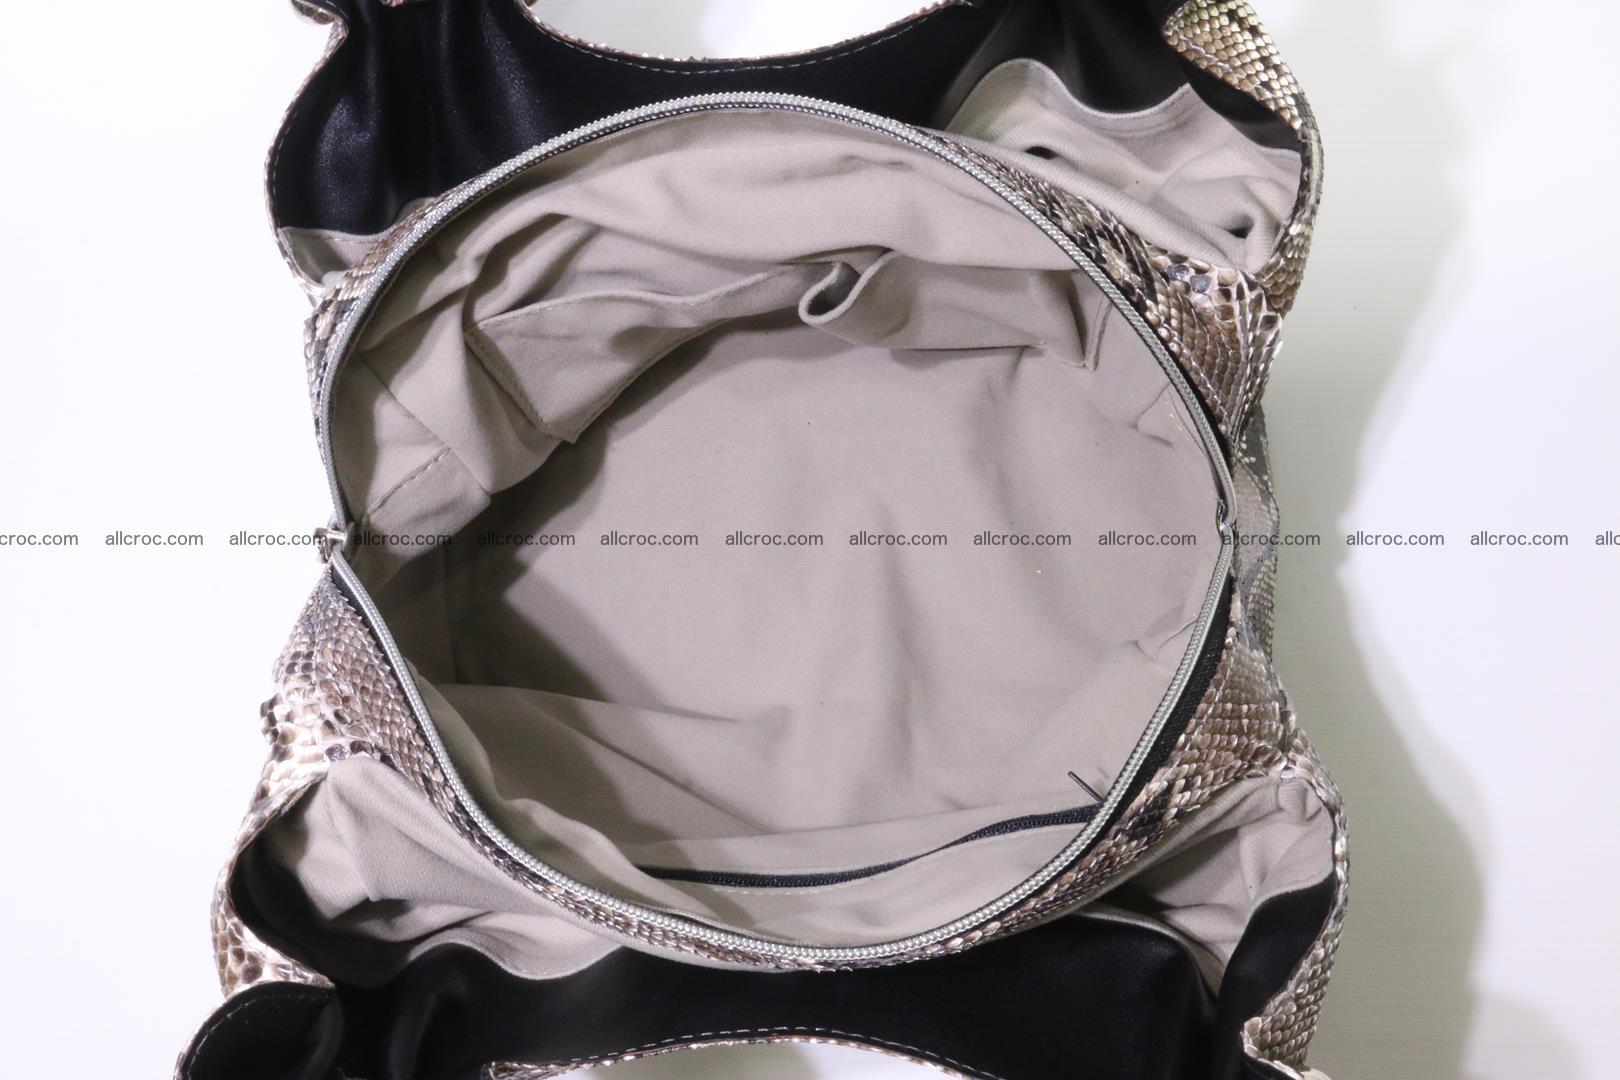 Python skin handbag for lady from genuine Python skin 202 Foto 10